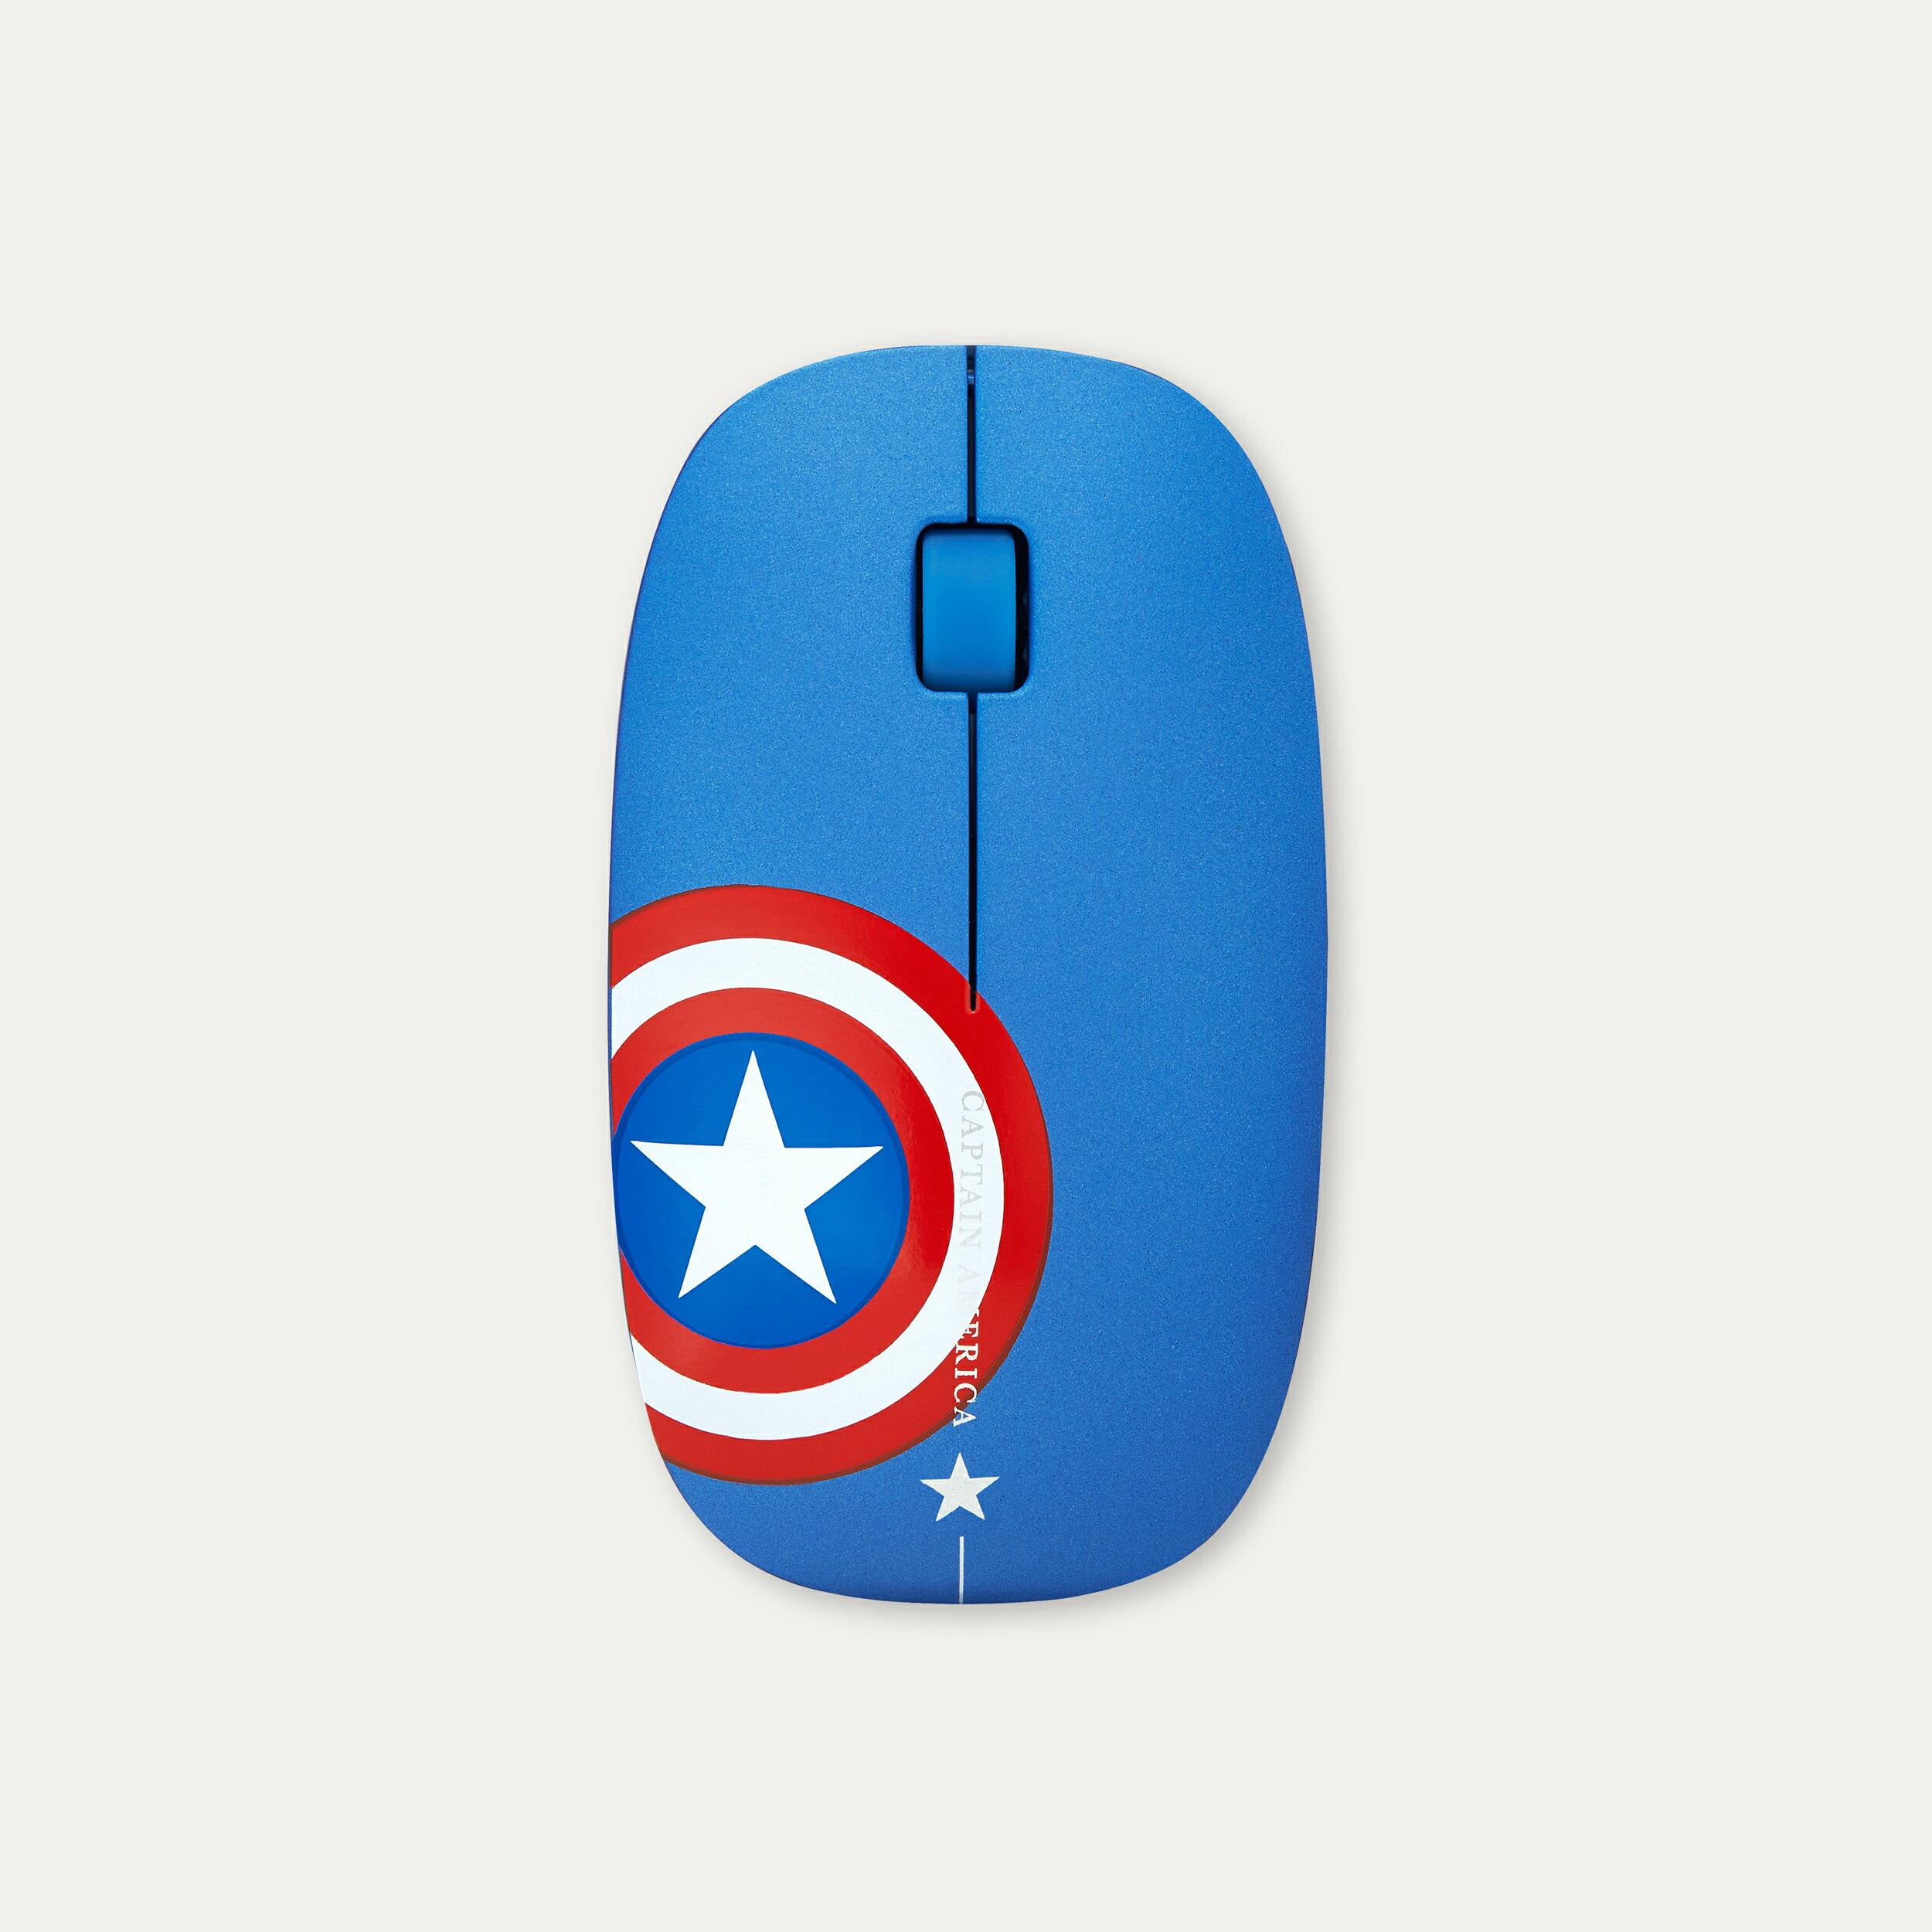 infoThink 漫威 復仇者聯盟系列 〈美國隊長 Captain America〉無線光學靜音滑鼠 無線滑鼠 電腦週邊 正版3C